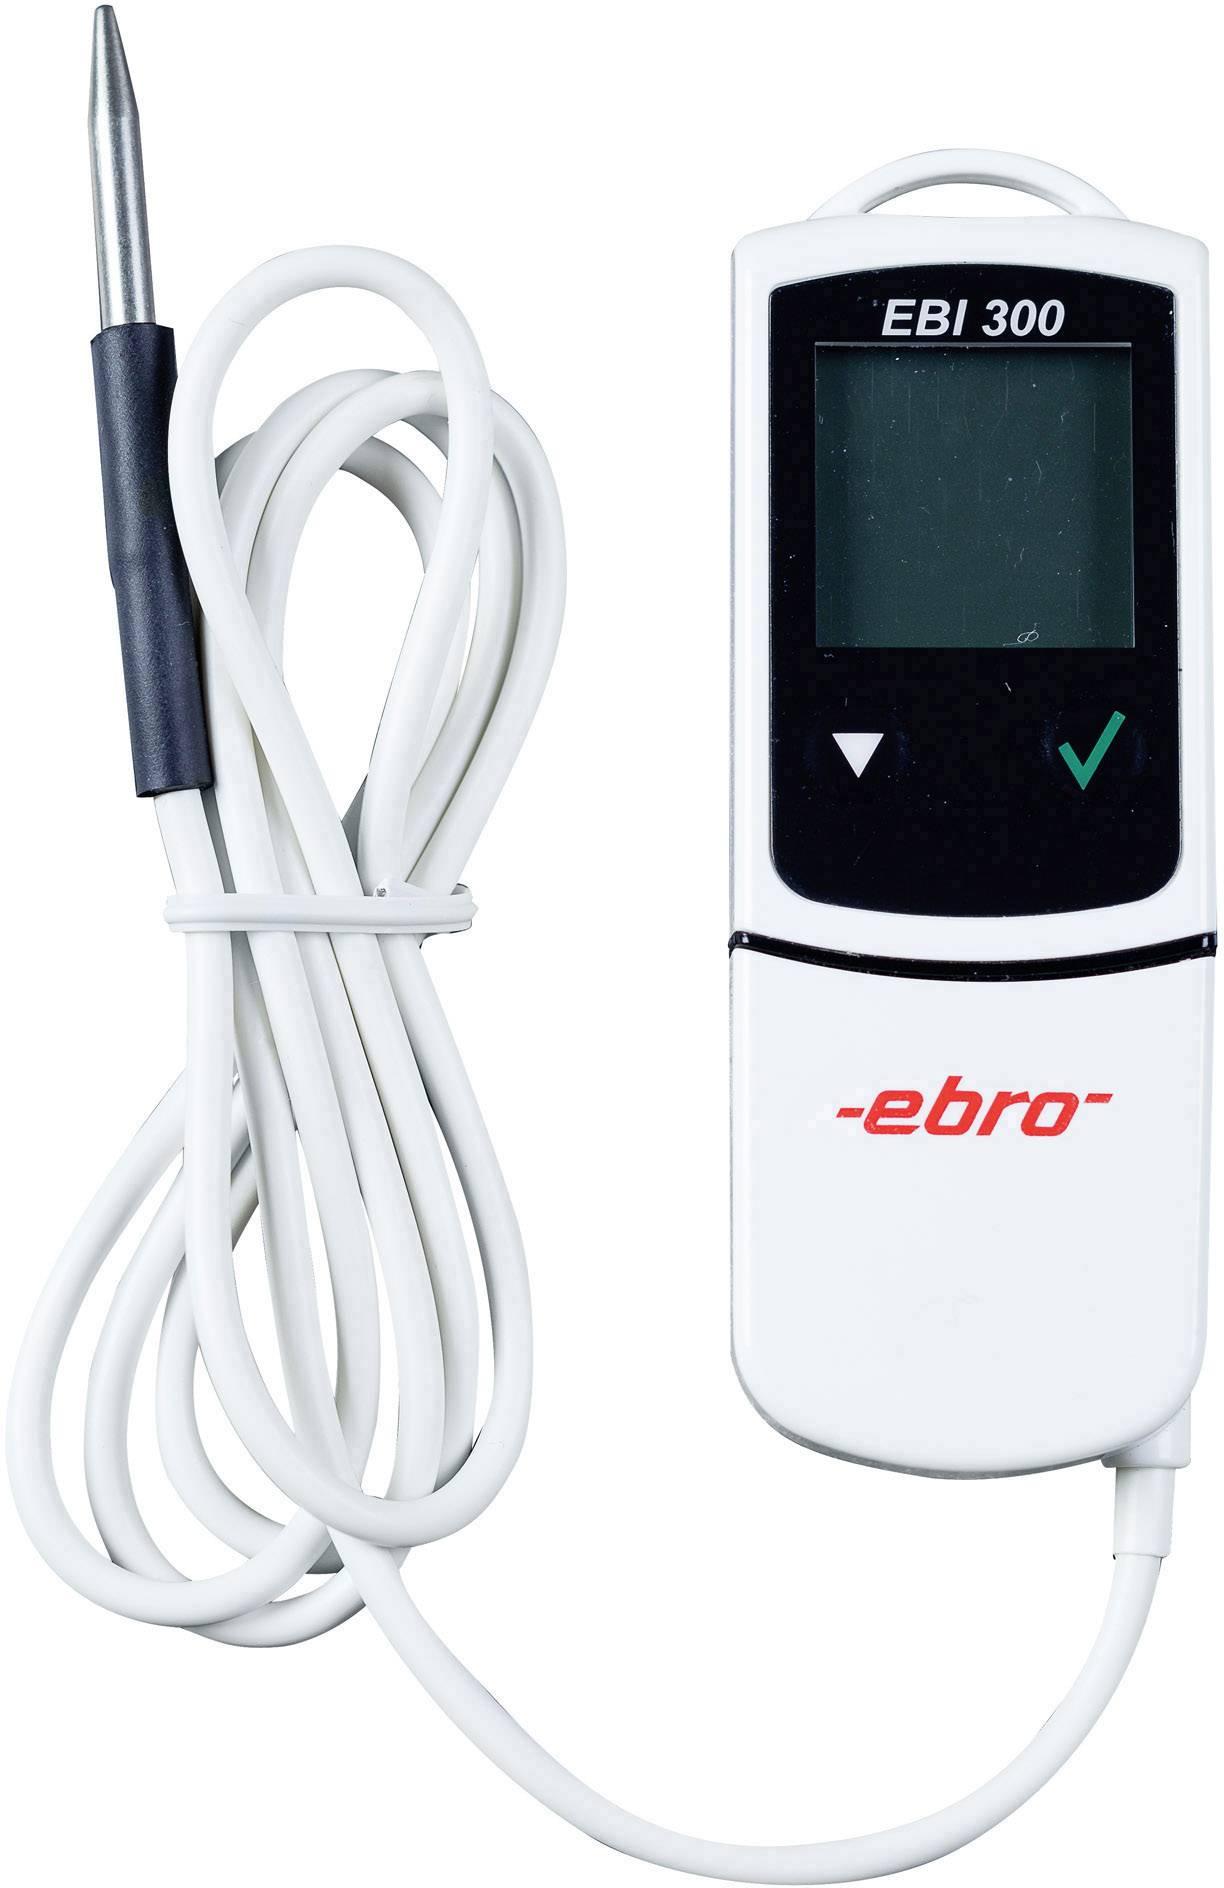 Teplotný datalogger (merač) ebro EBI 300 TE